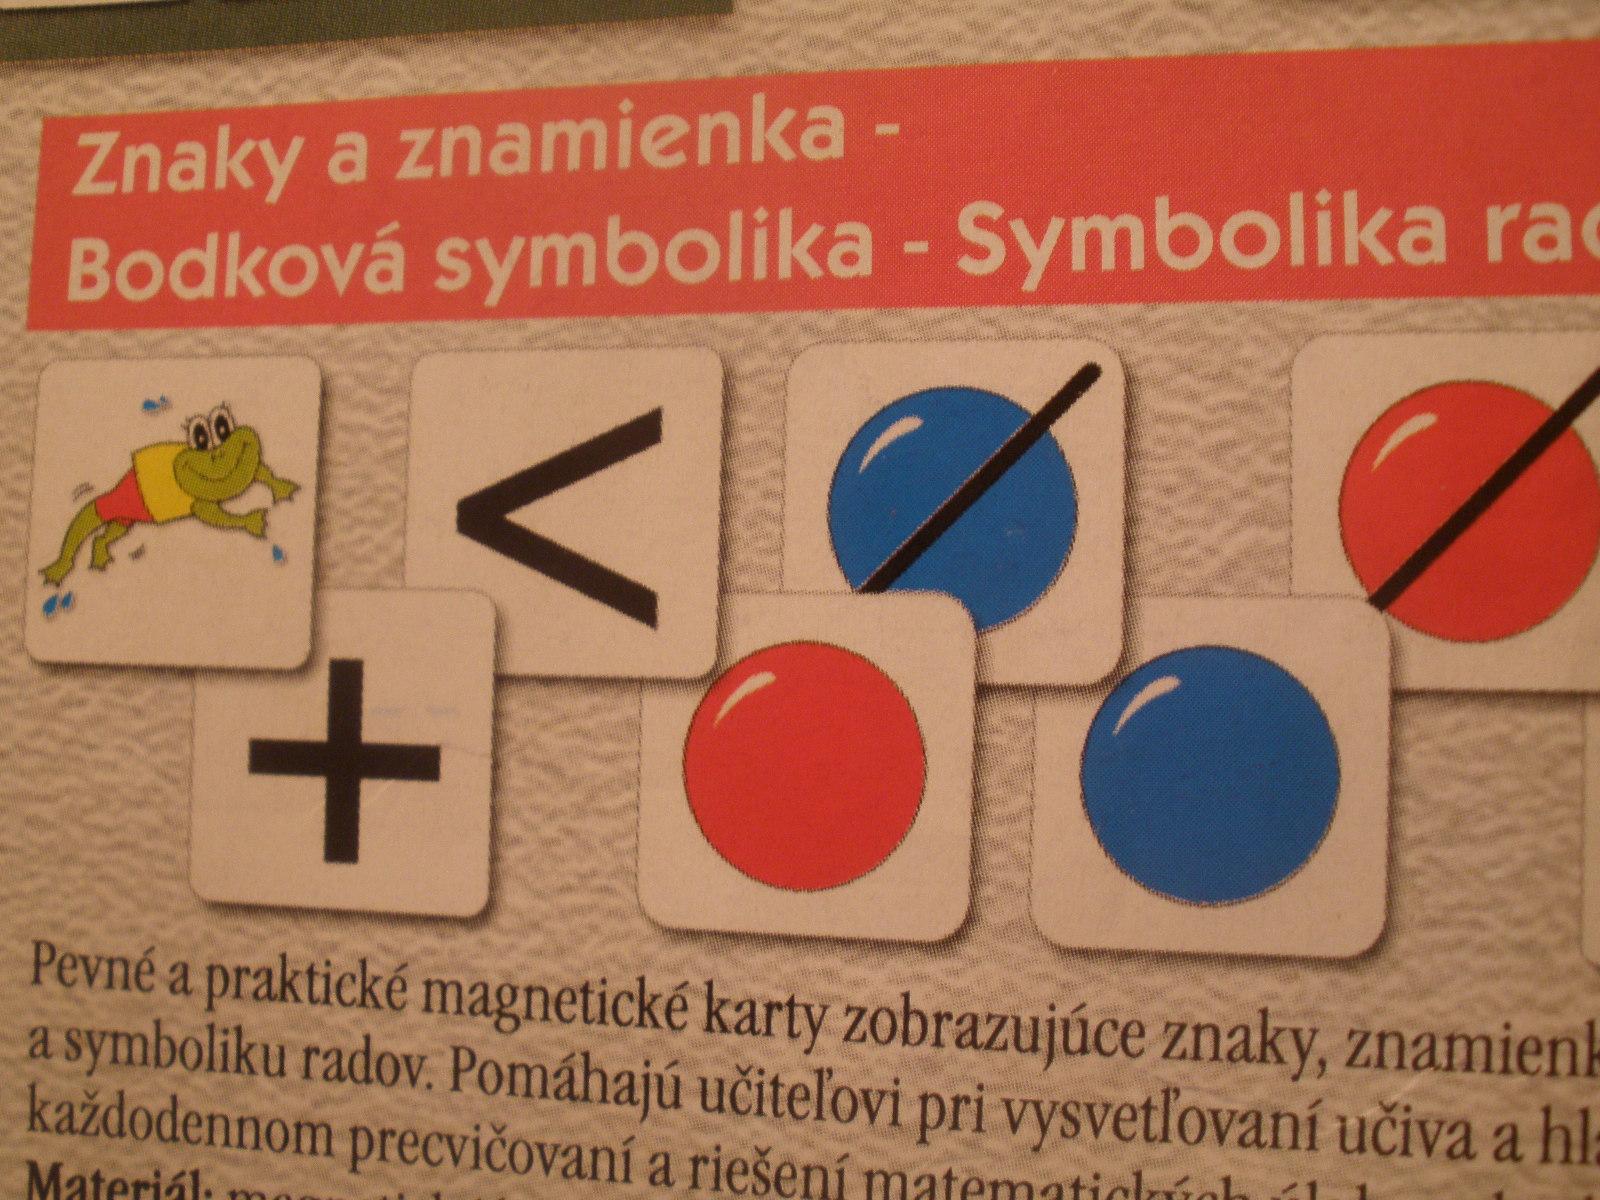 Symbolika radov 4x10